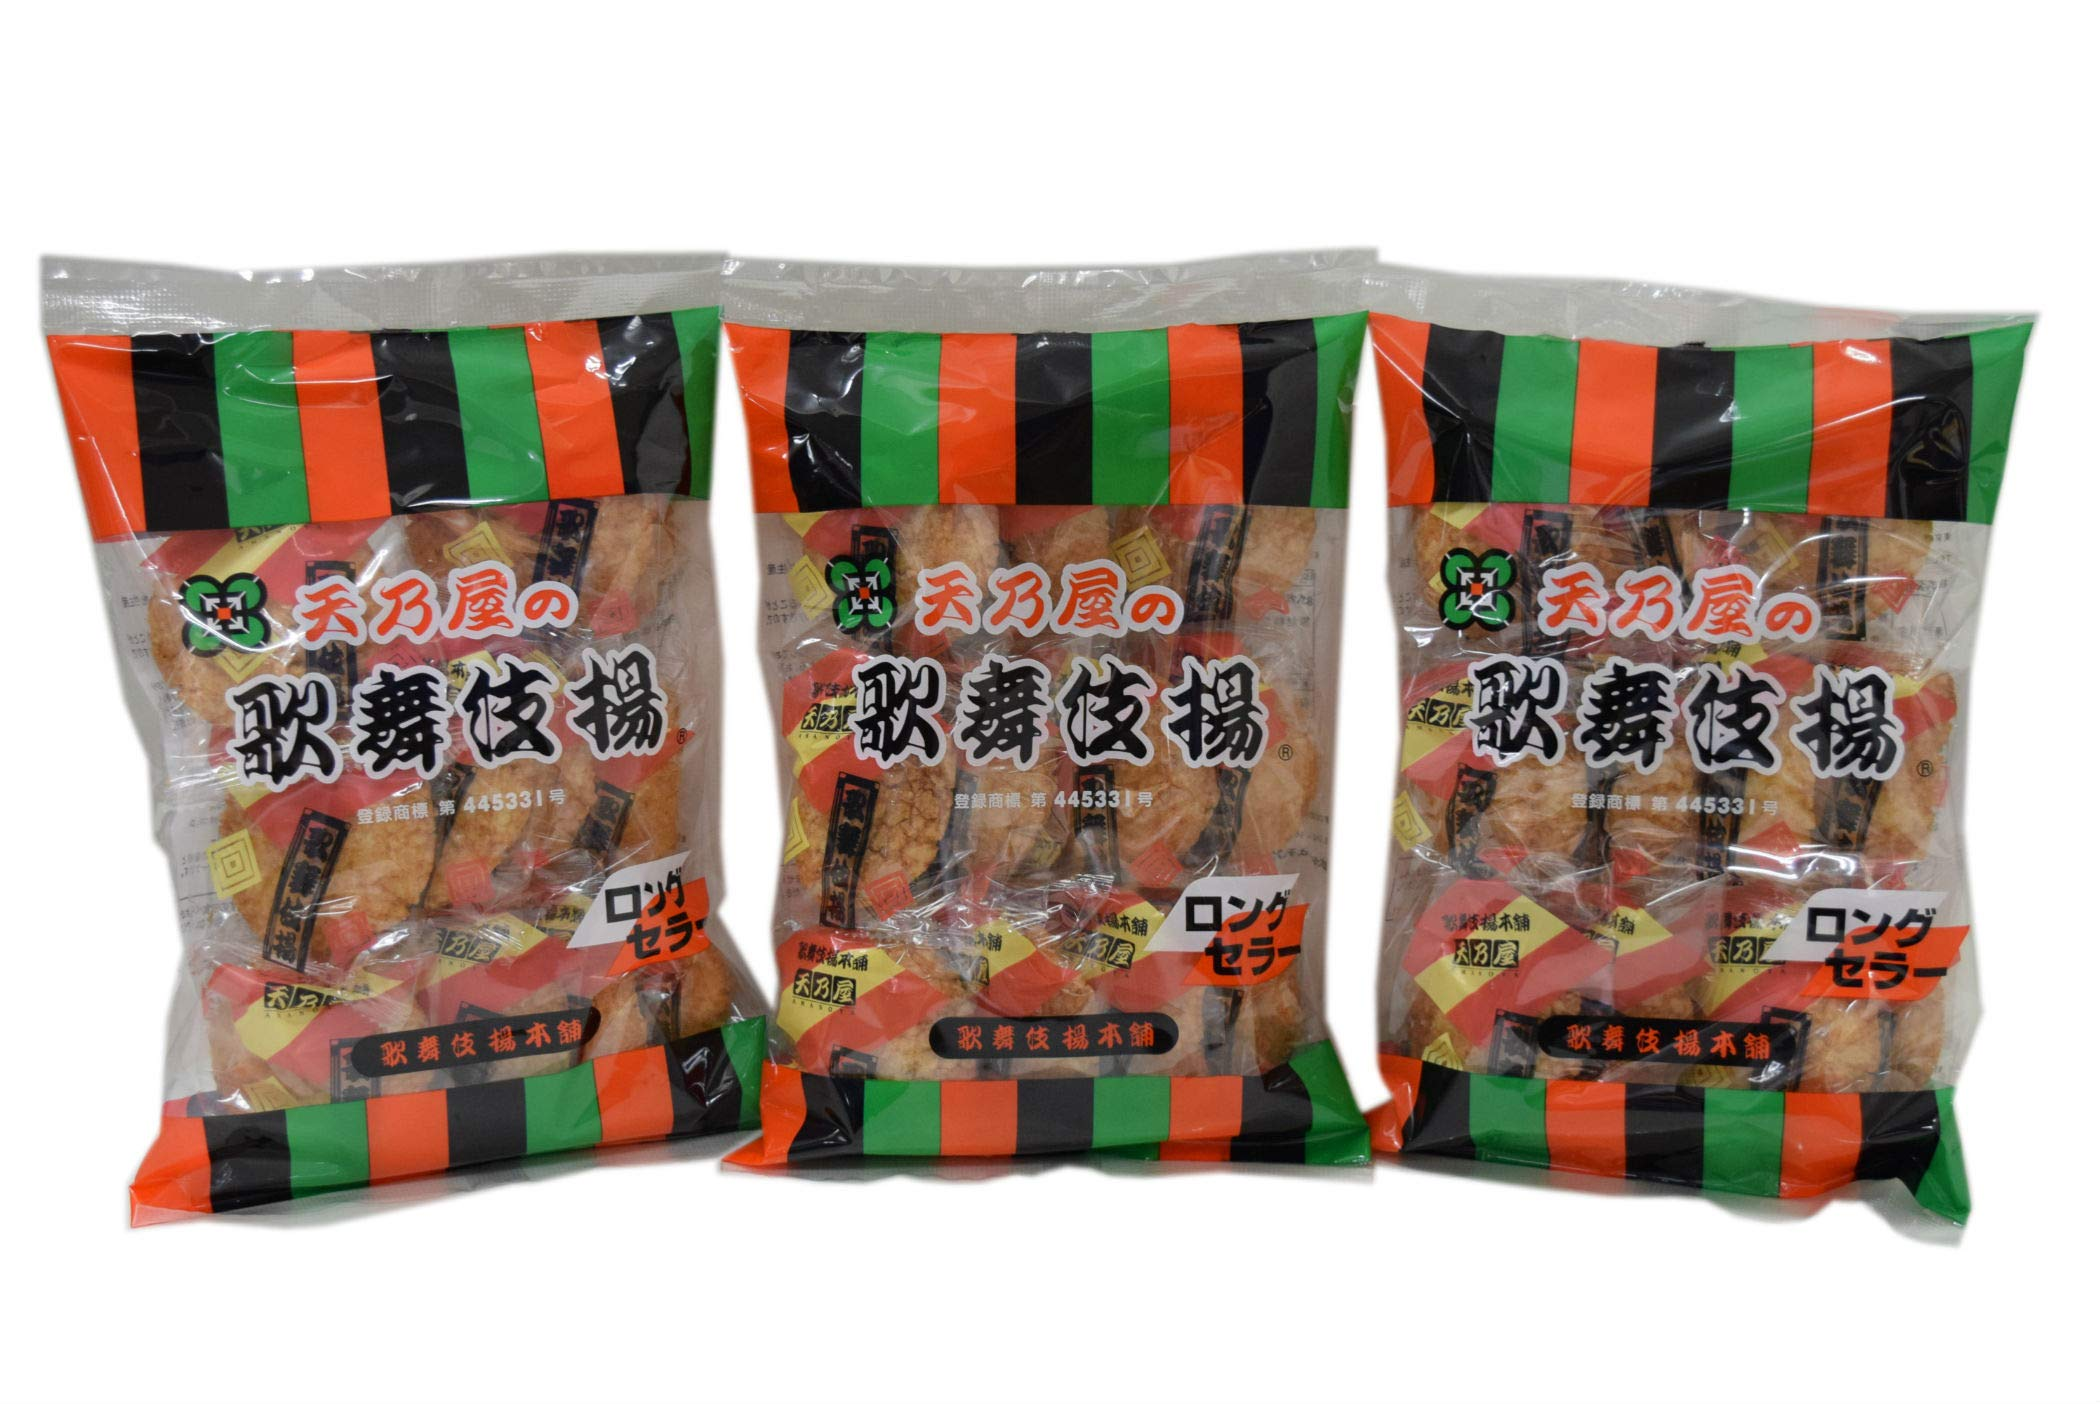 Amanoya Kabukiage Rice Cracker total 3 packs. Made in Japan. No. a043